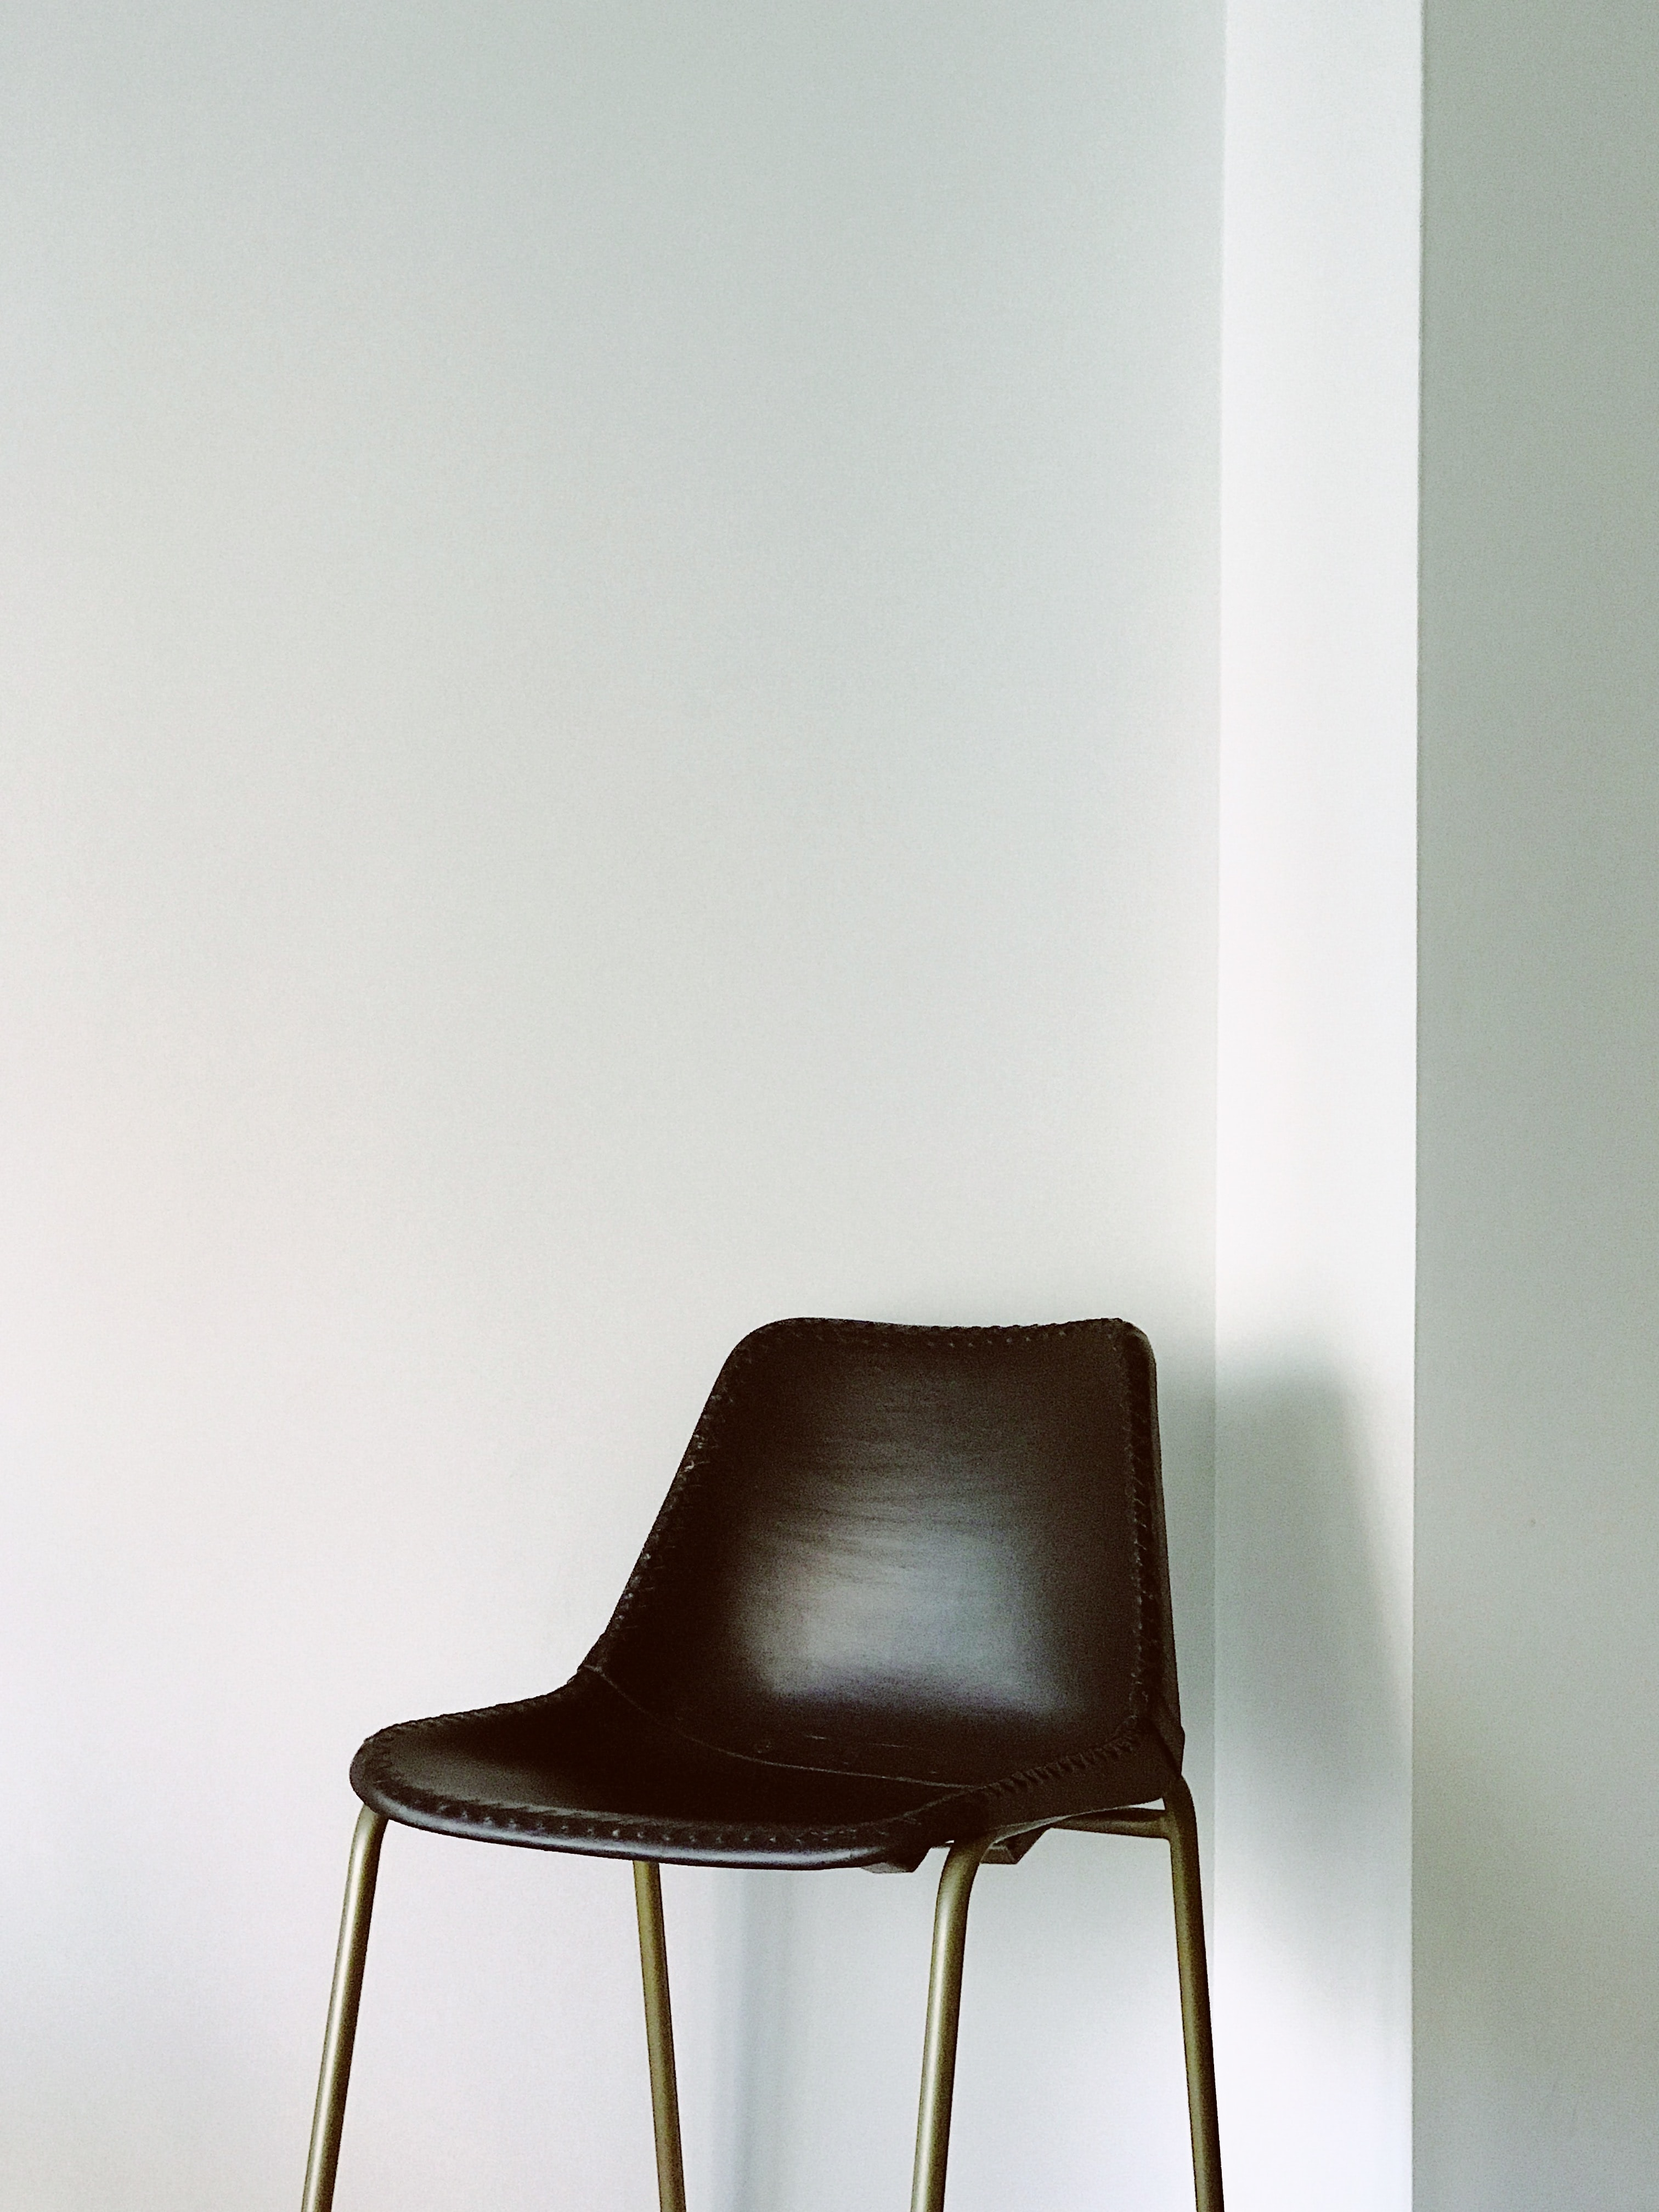 brown chair near white painted wall